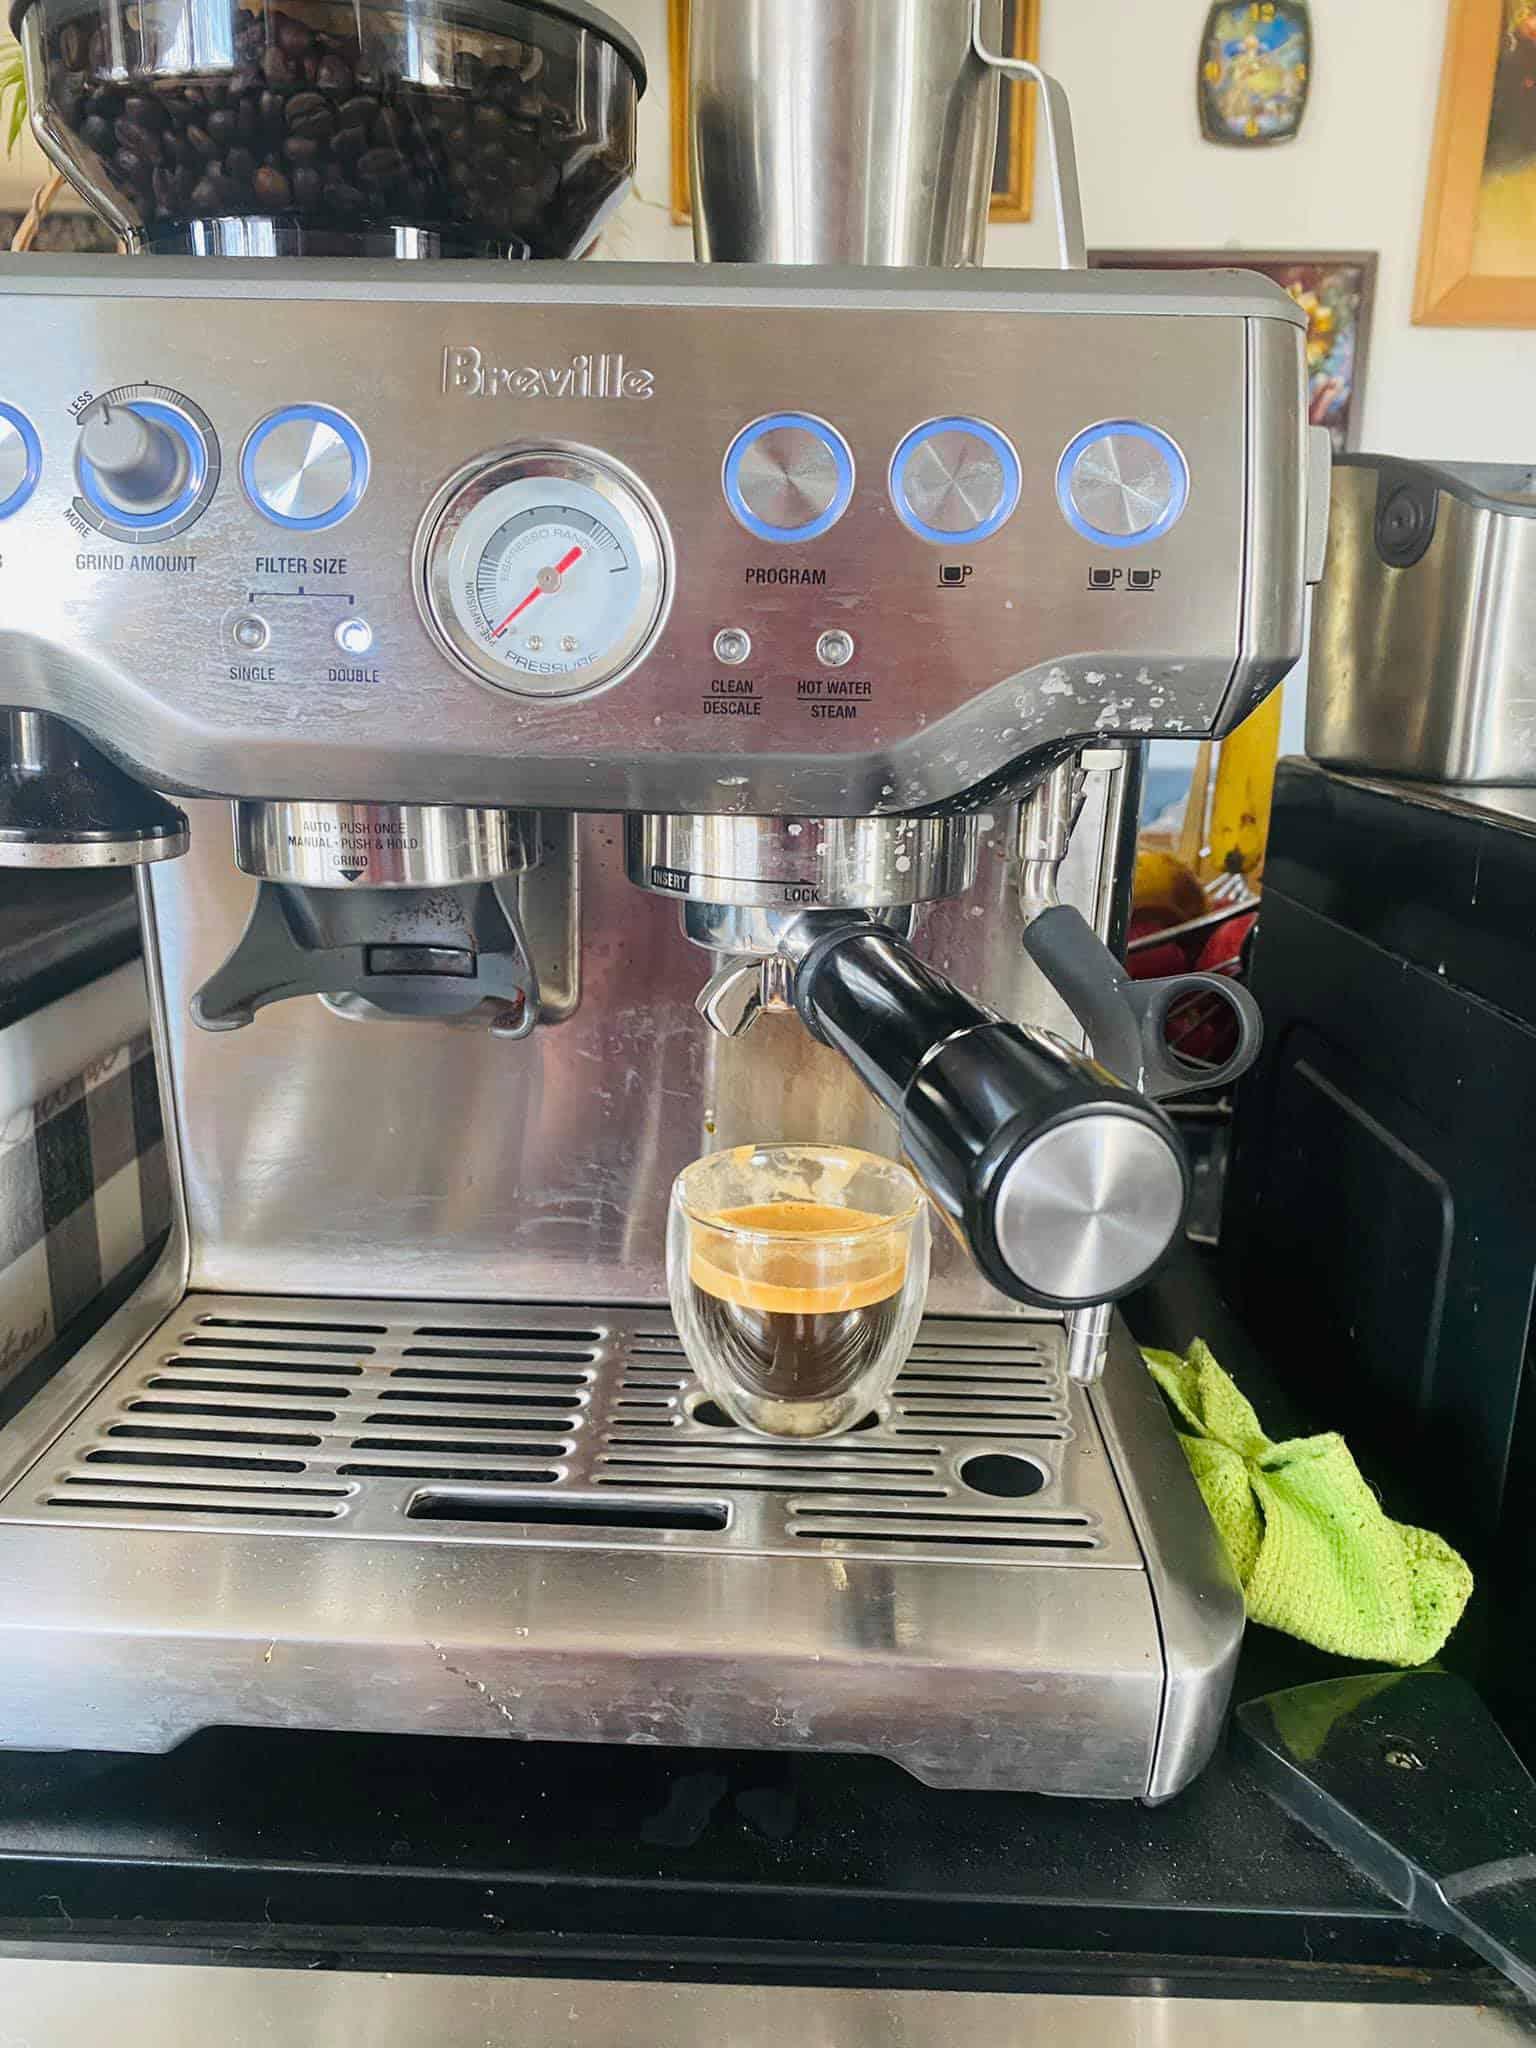 Breville Barista Express Heating Element